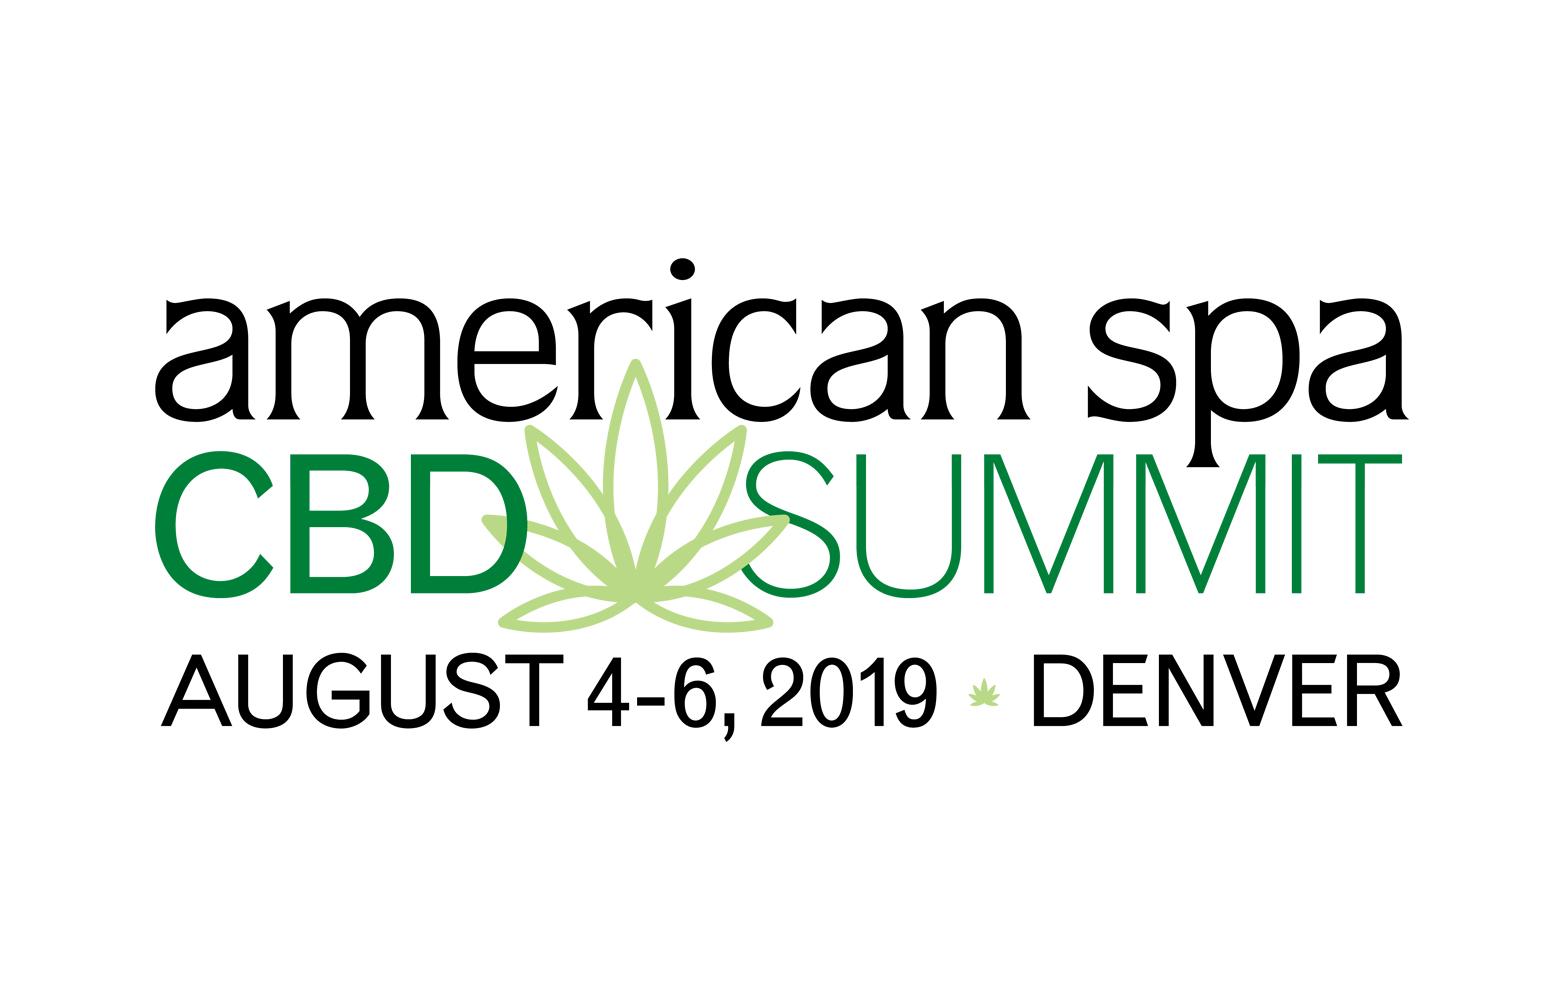 Questex's American Spa CBD Summit to Host Wellness Decision